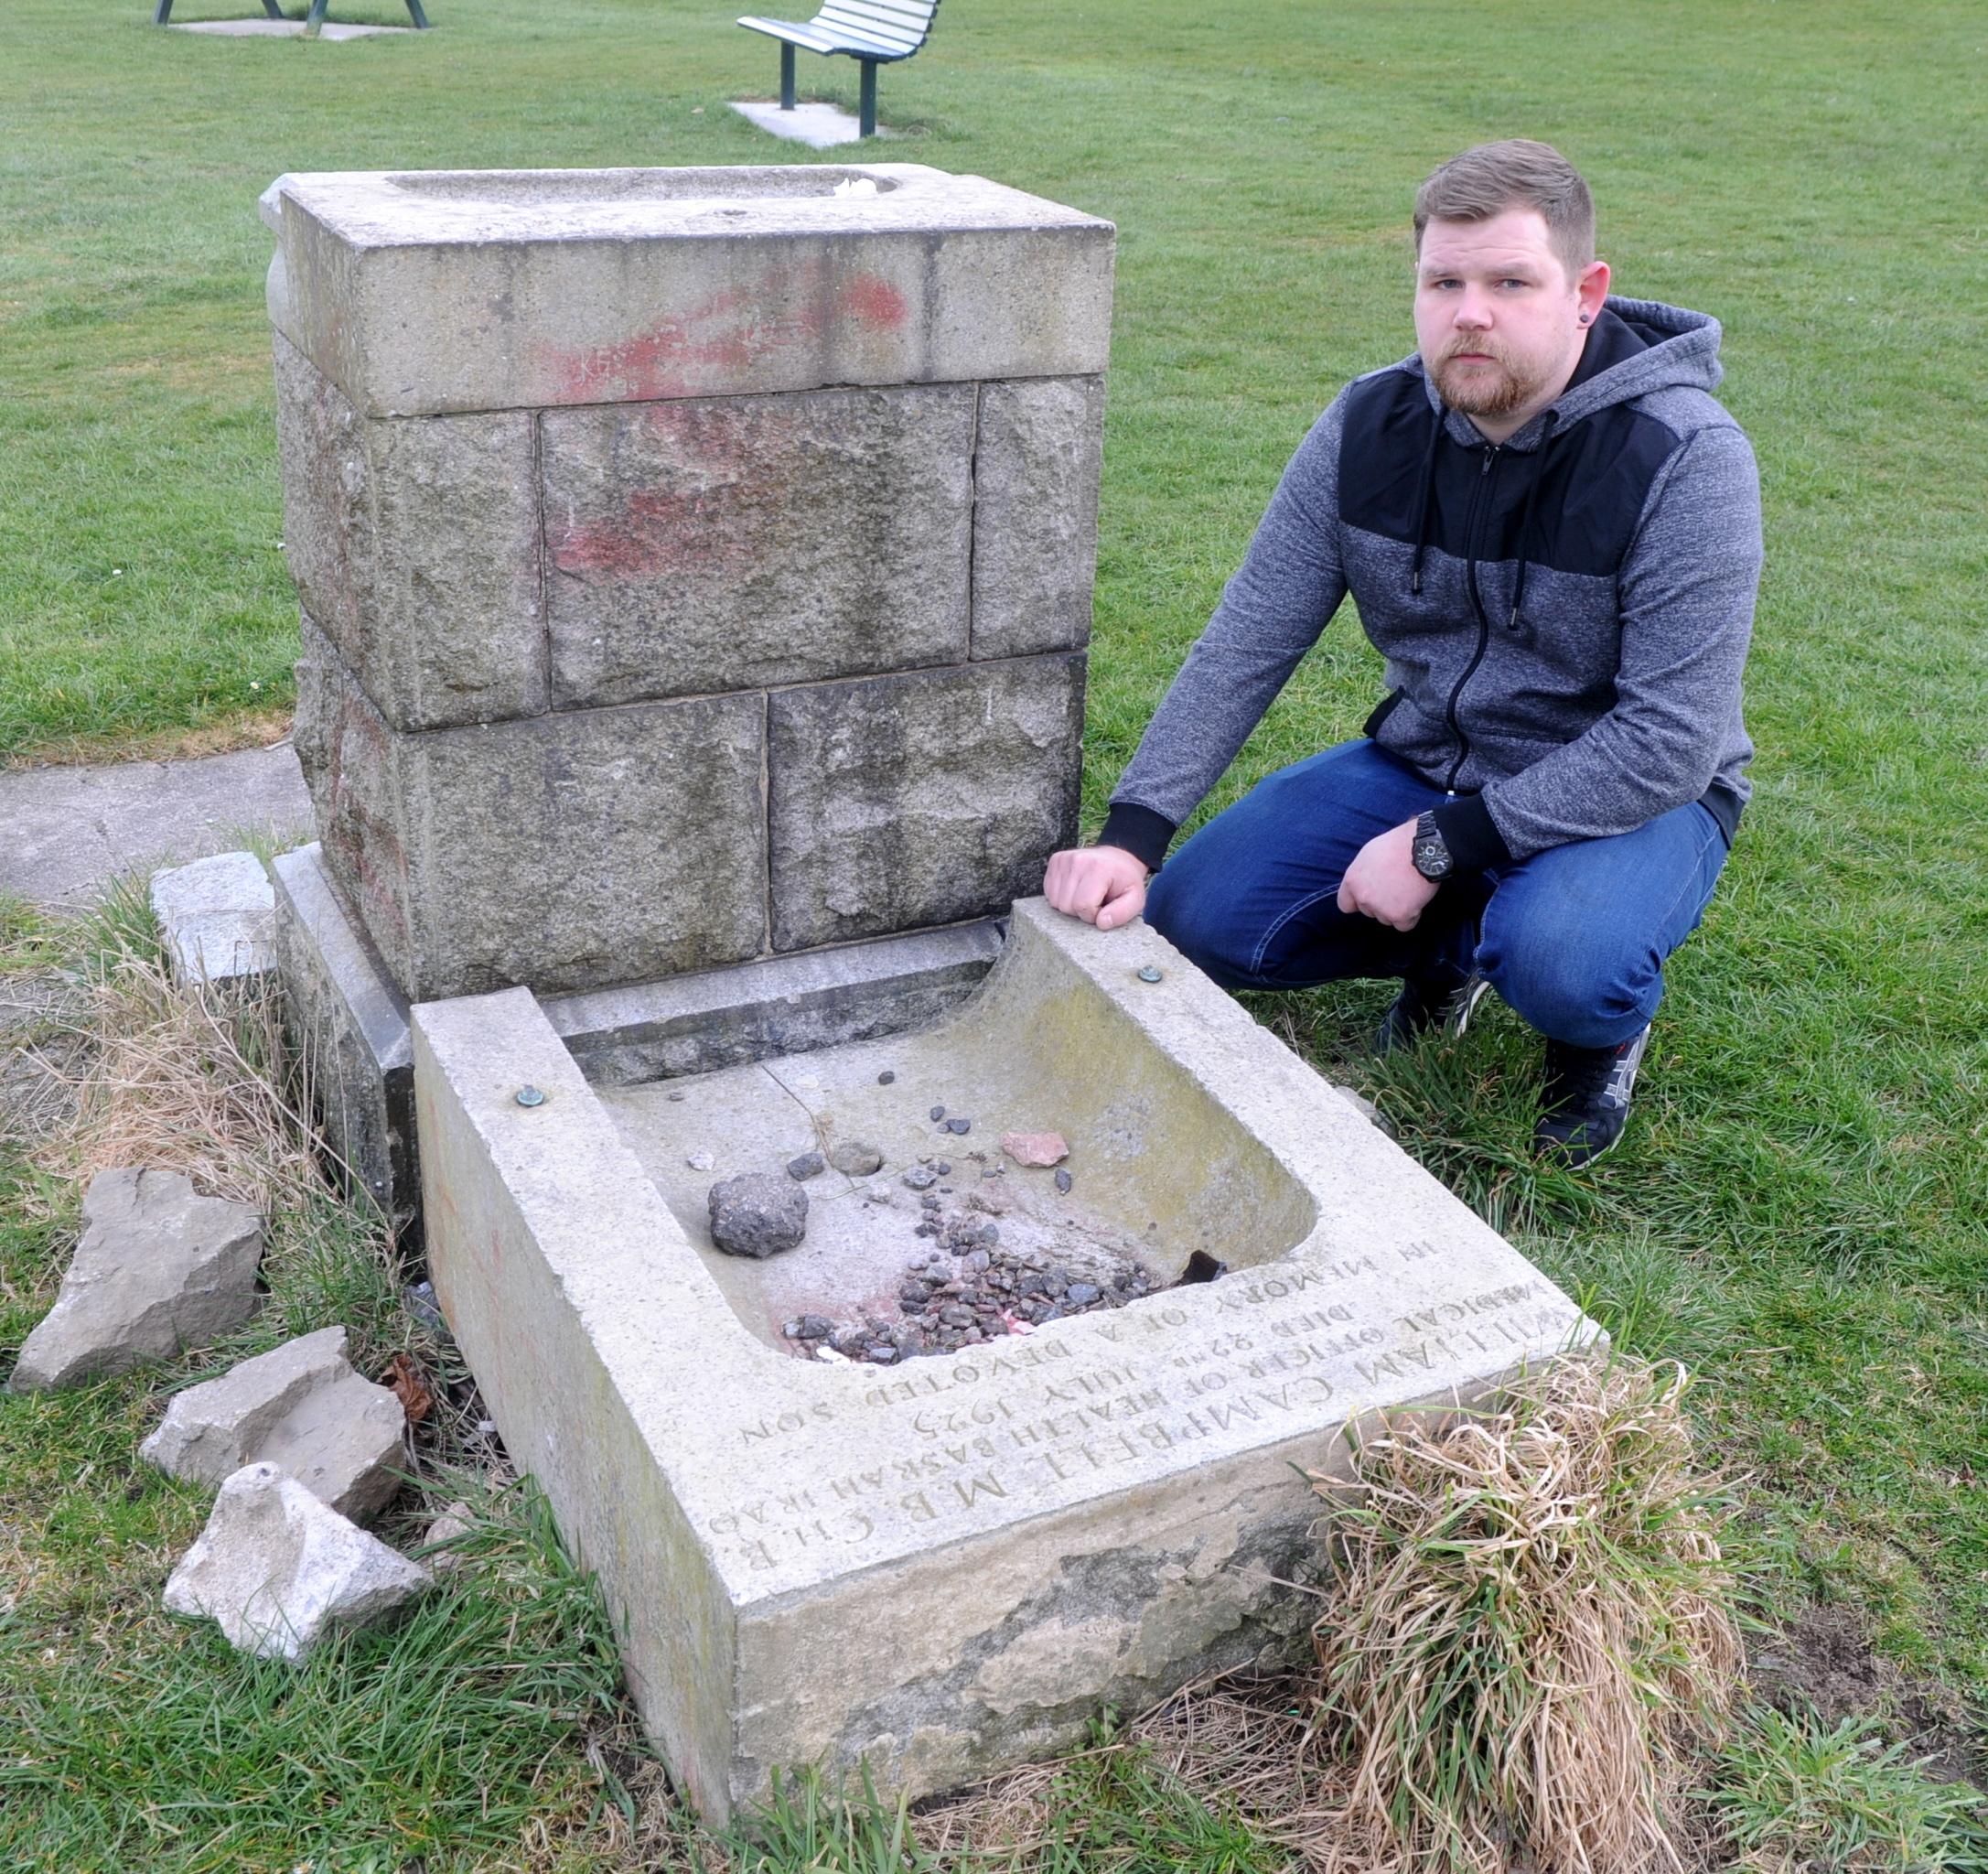 Craig Jeffrey  next to  the   memorial in the Bucksburn park.